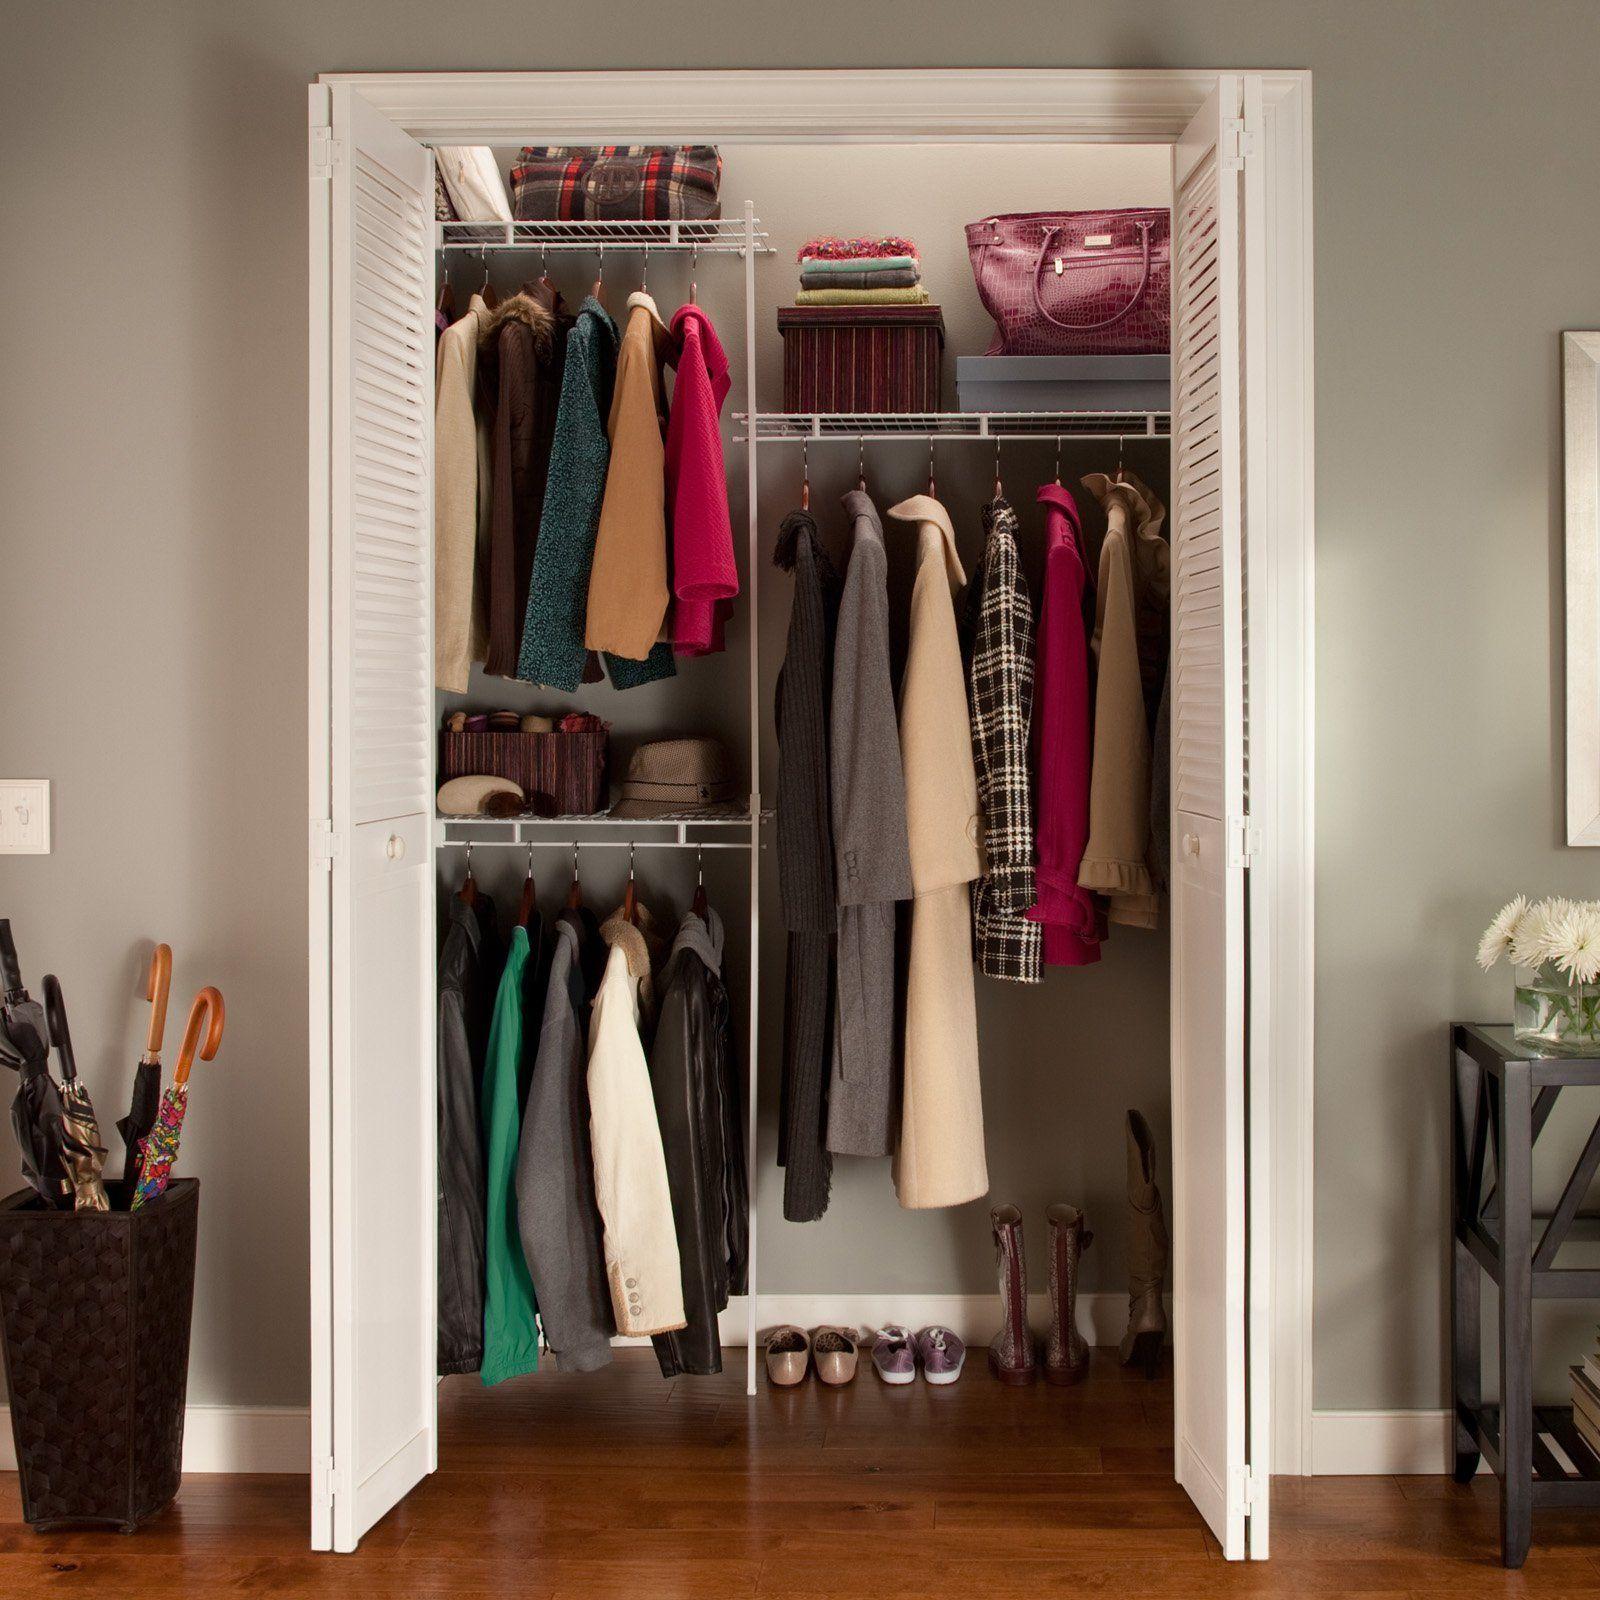 ClosetMaid Up To 5 Ft. Closet Organizer